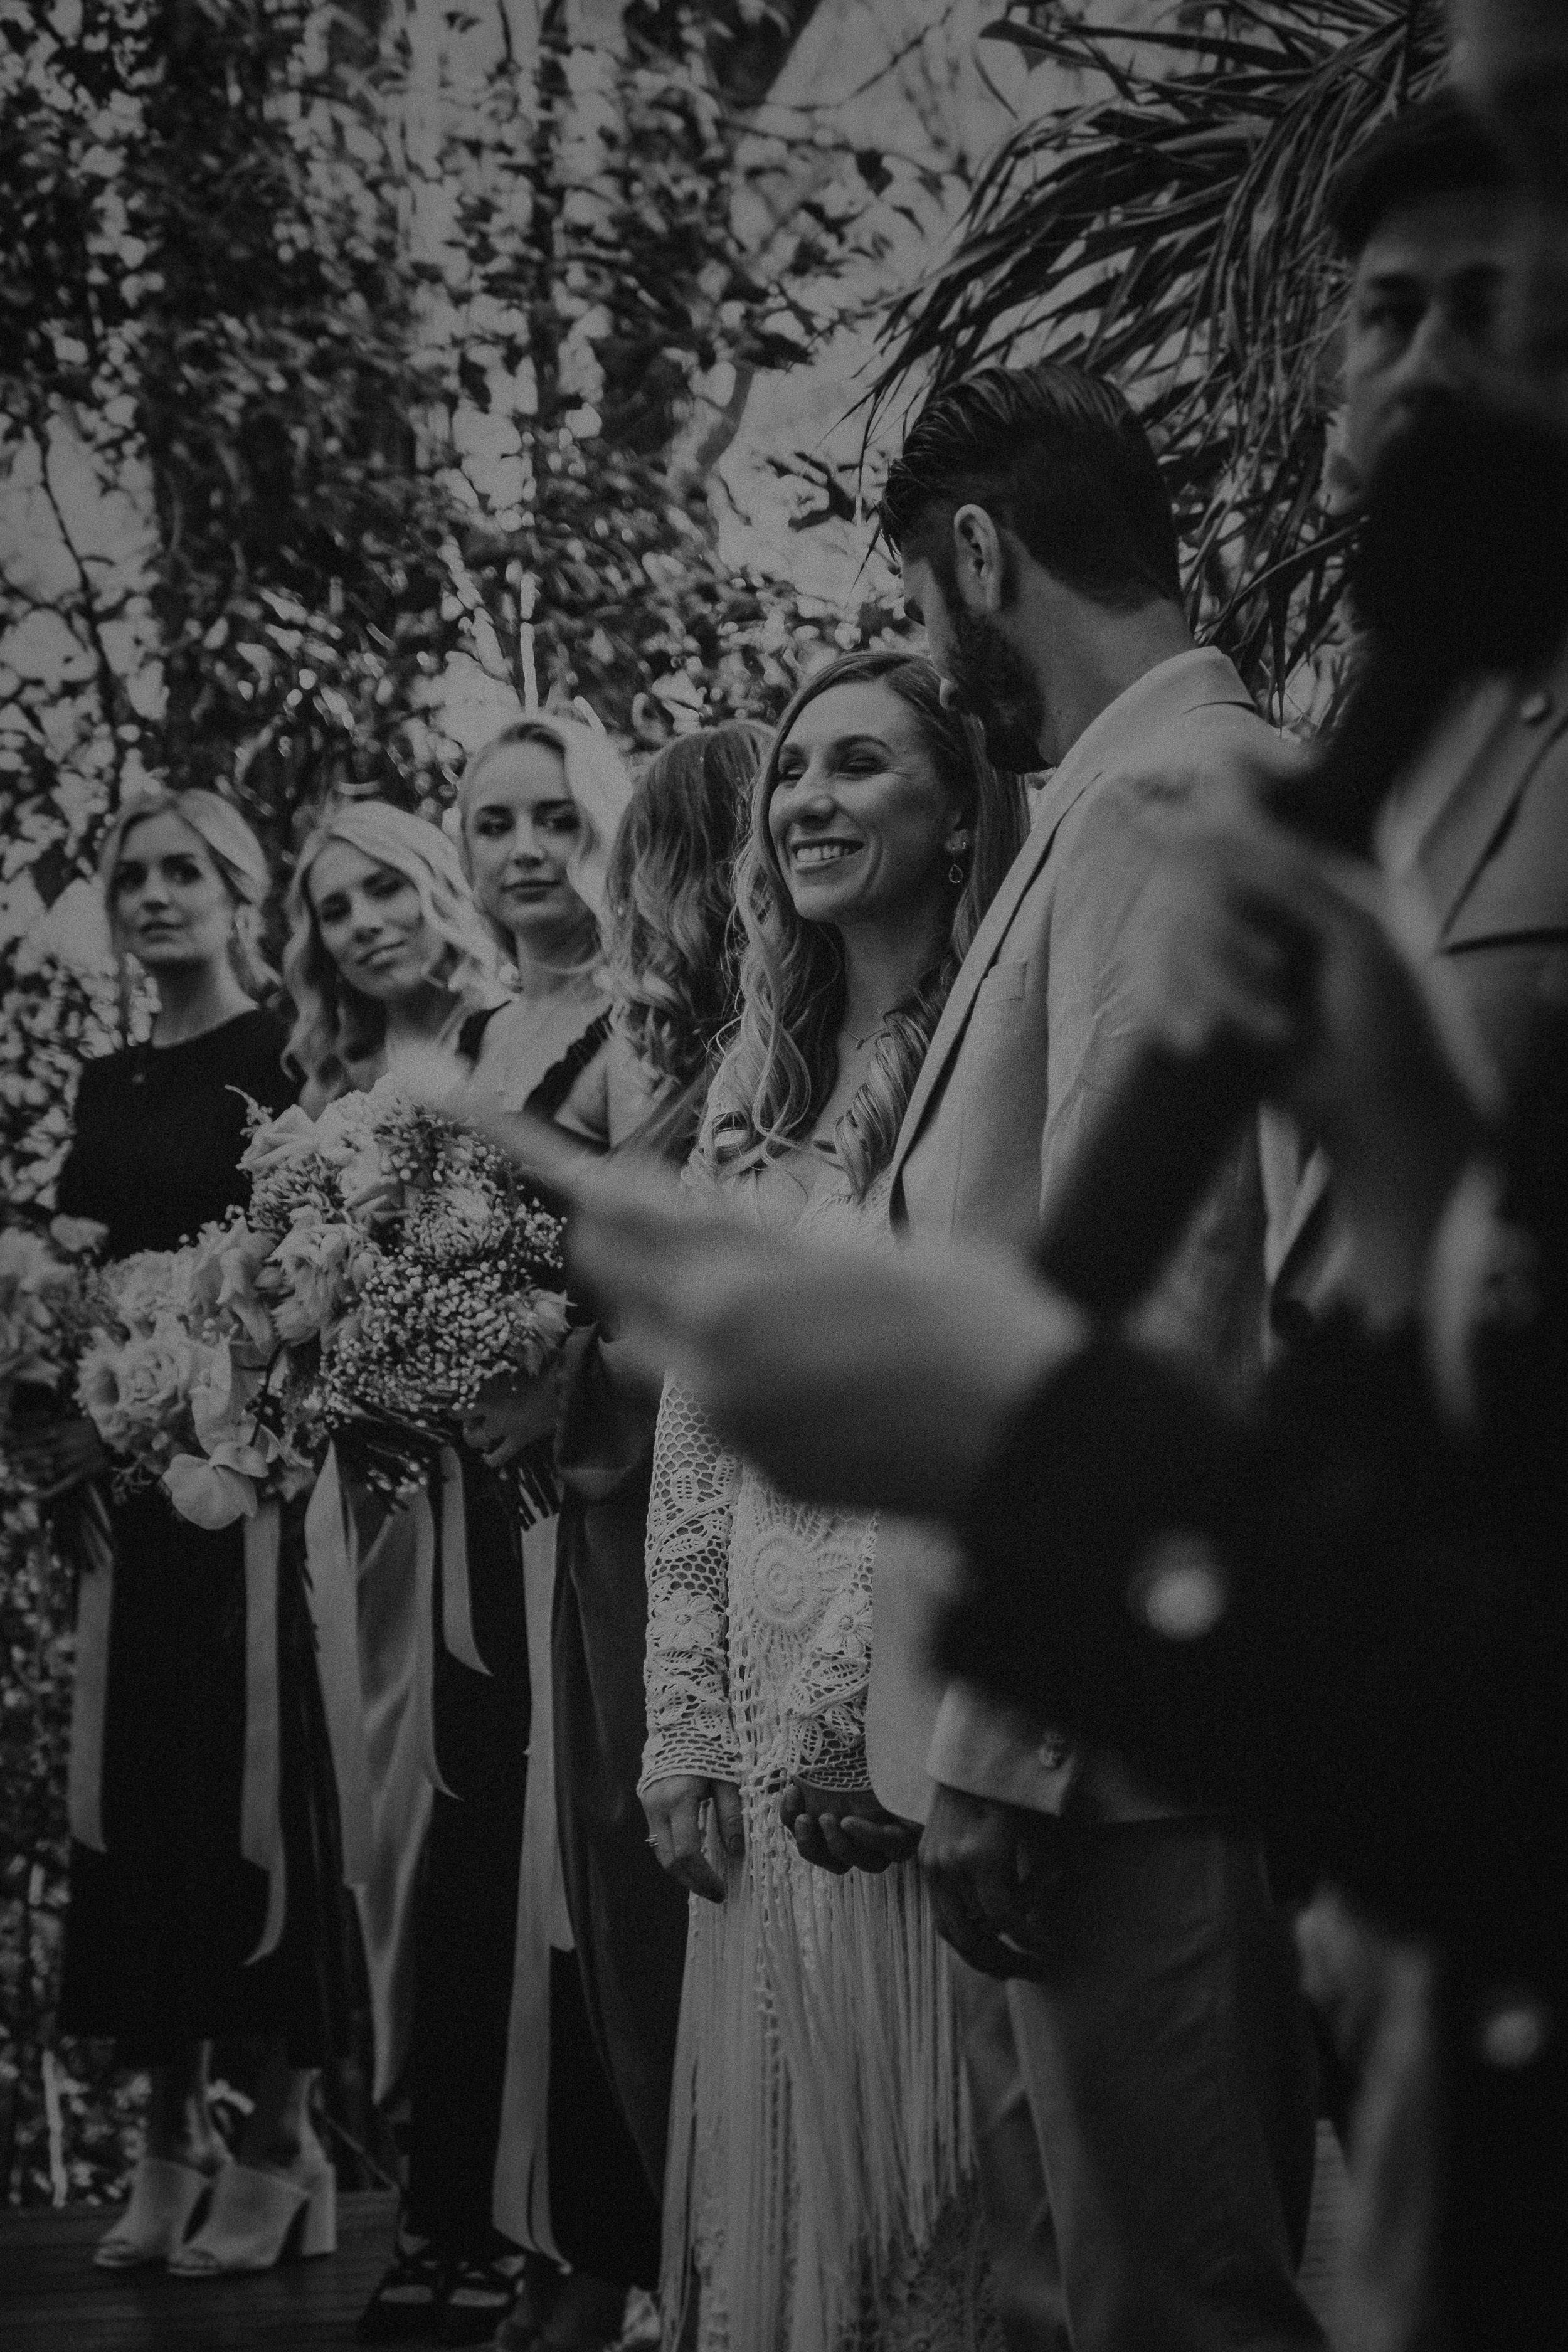 S&A Elopement - Kings & Thieves - Shred 'Til Dead - Central Coast Beach Forest Wedding - 239.jpg